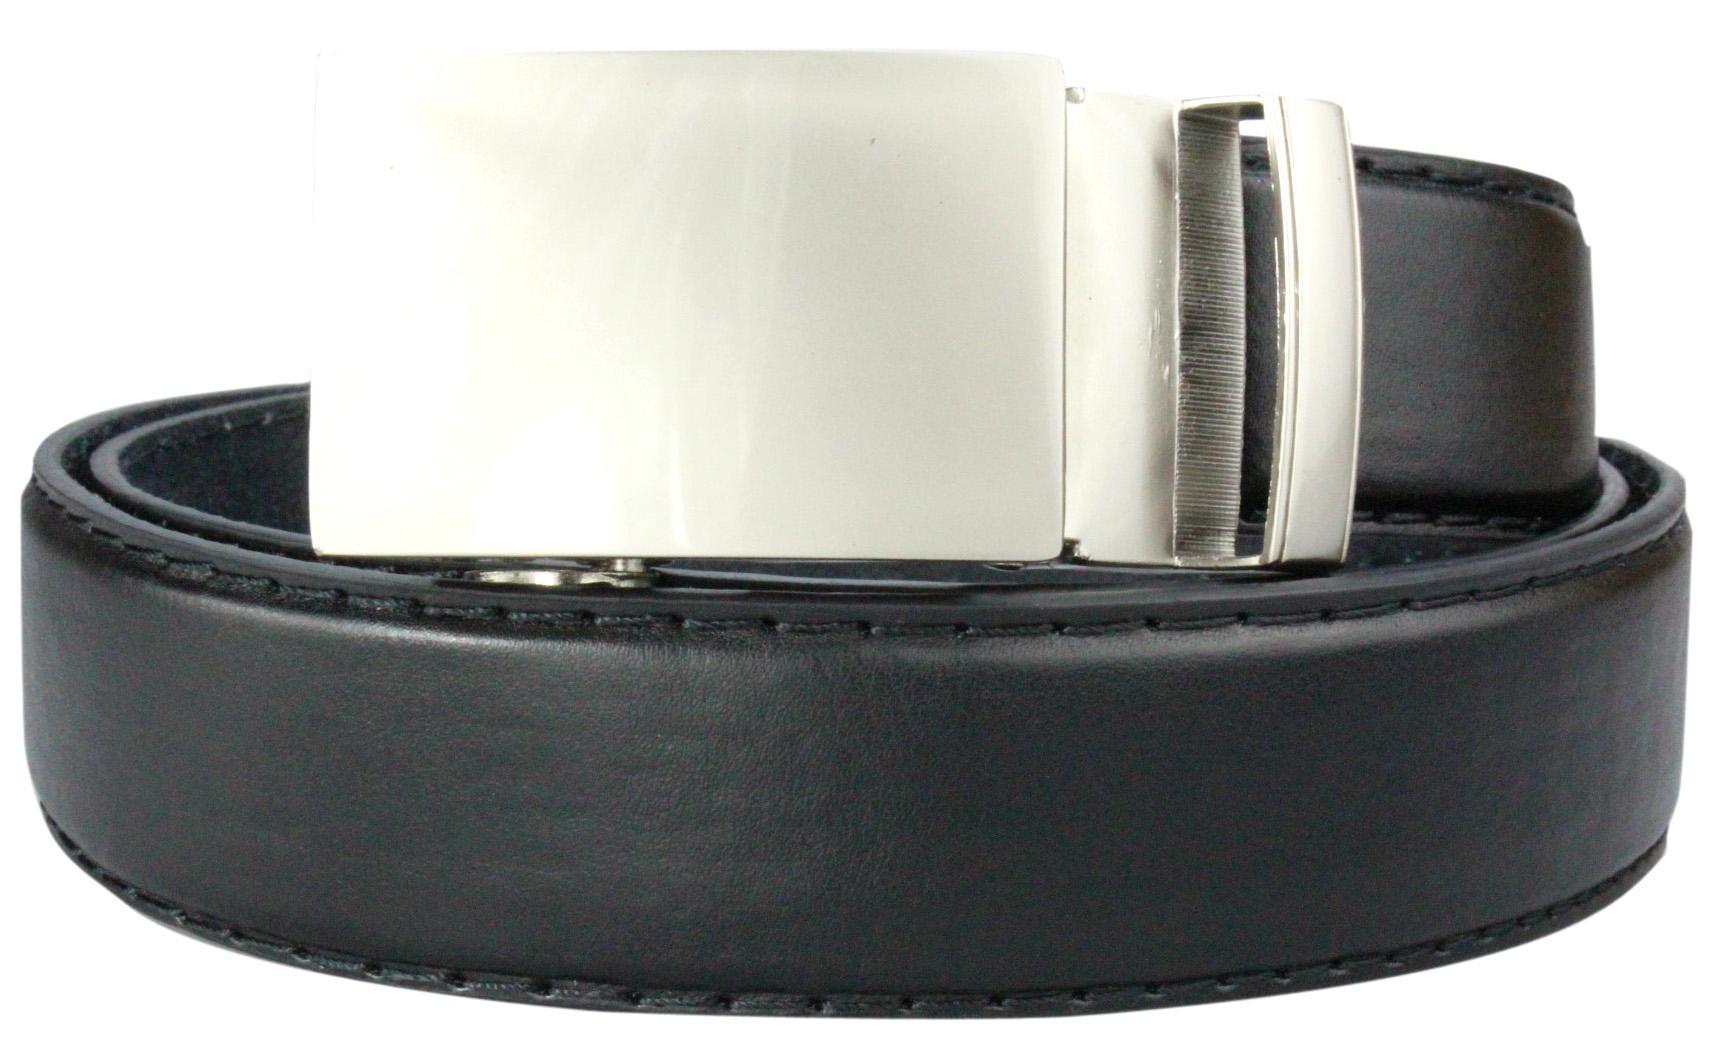 Herren-Lederguertel-Automatik-Guertel-110-135cm-schwarz-versch-Varianten